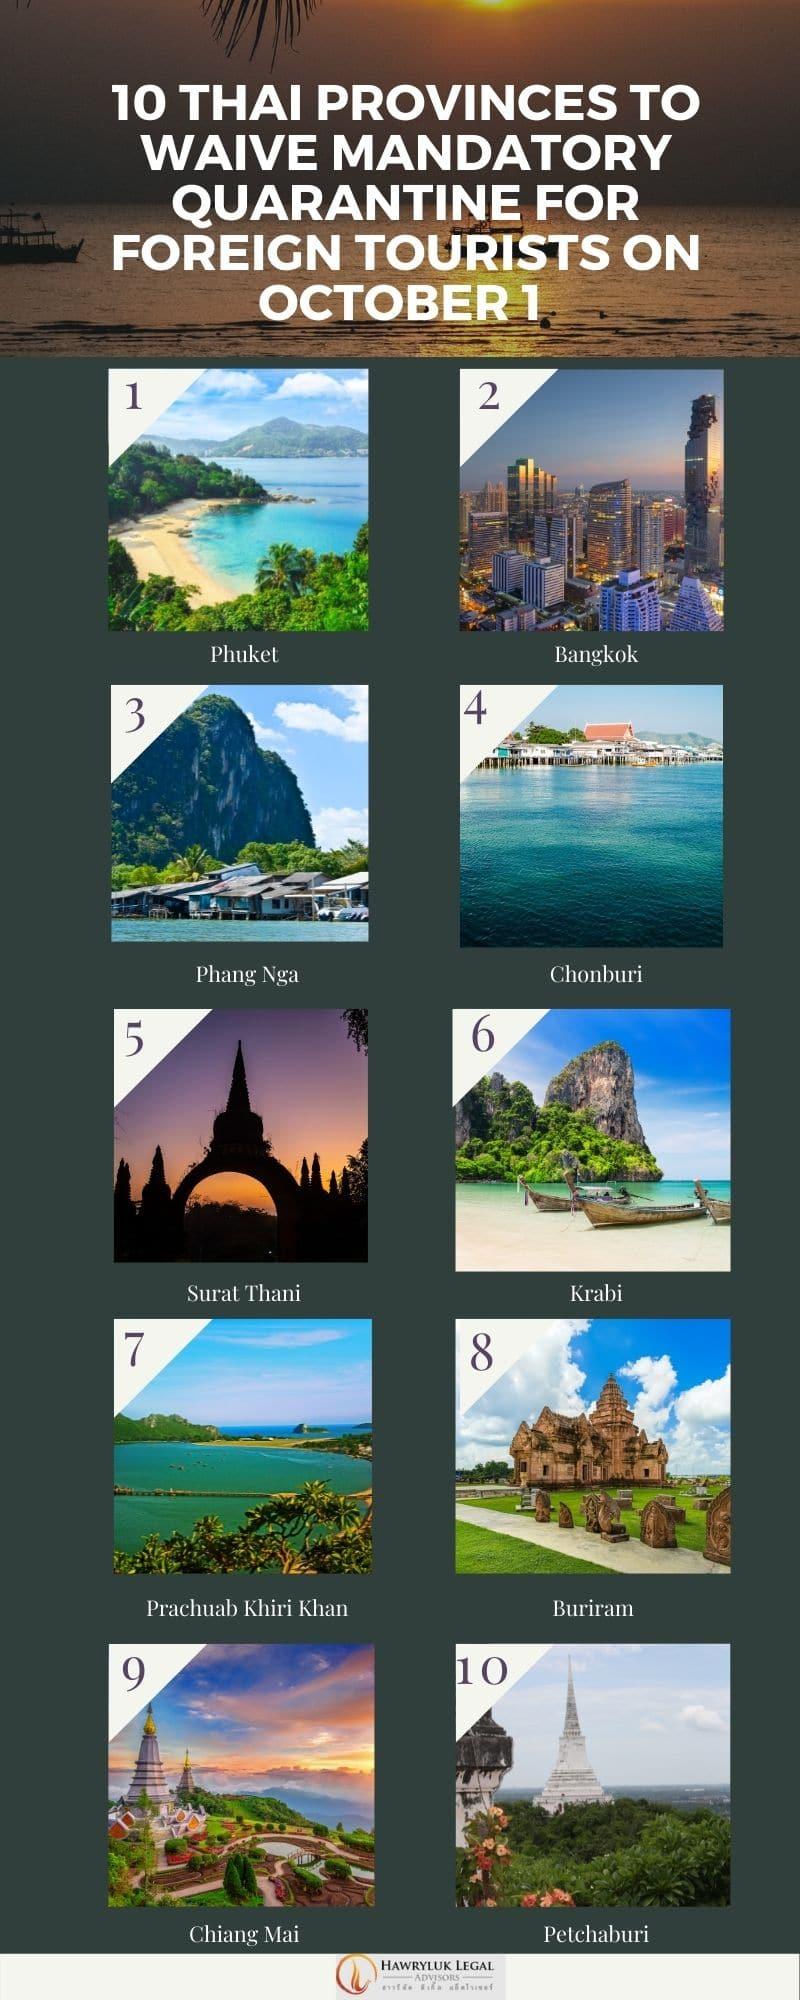 10 thai provinces to waive mandatory quarantine on October 1